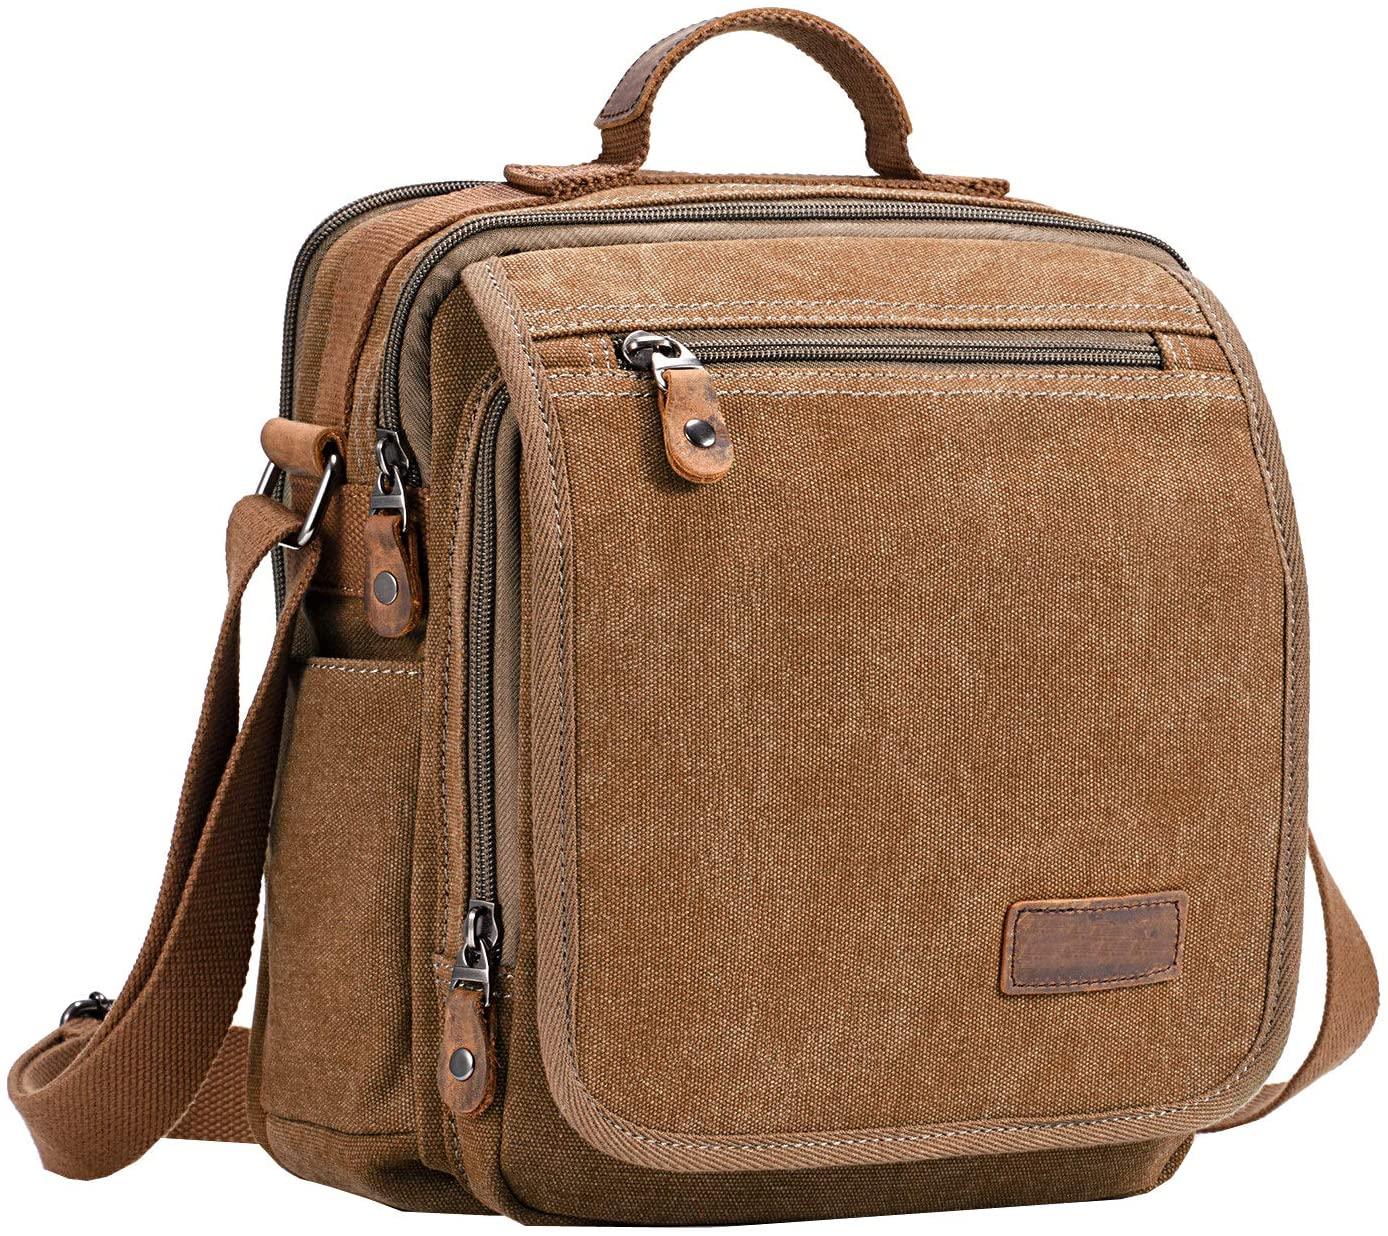 Iswee Crossbody Bag Canvas Messenger Bag for Men Canvas Shoulder Purse (Coffee)